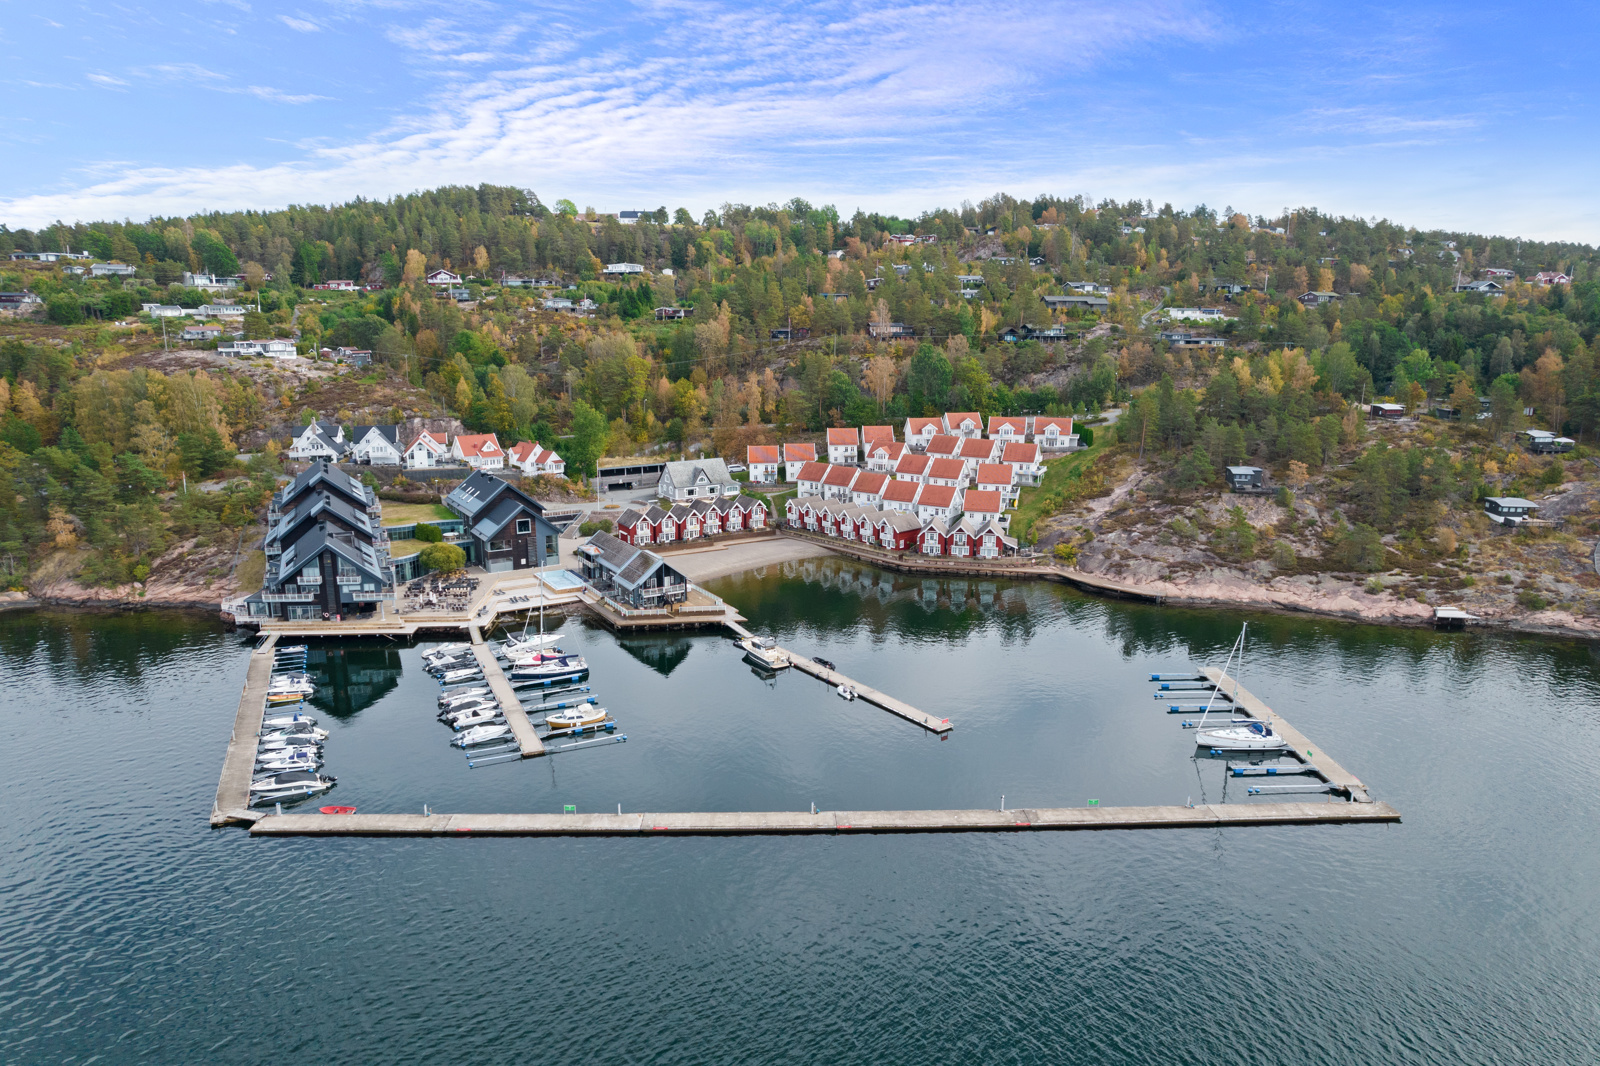 Holmsbu Resort - Følg de på facebook og se arrangementer og åpningstider for restauranten